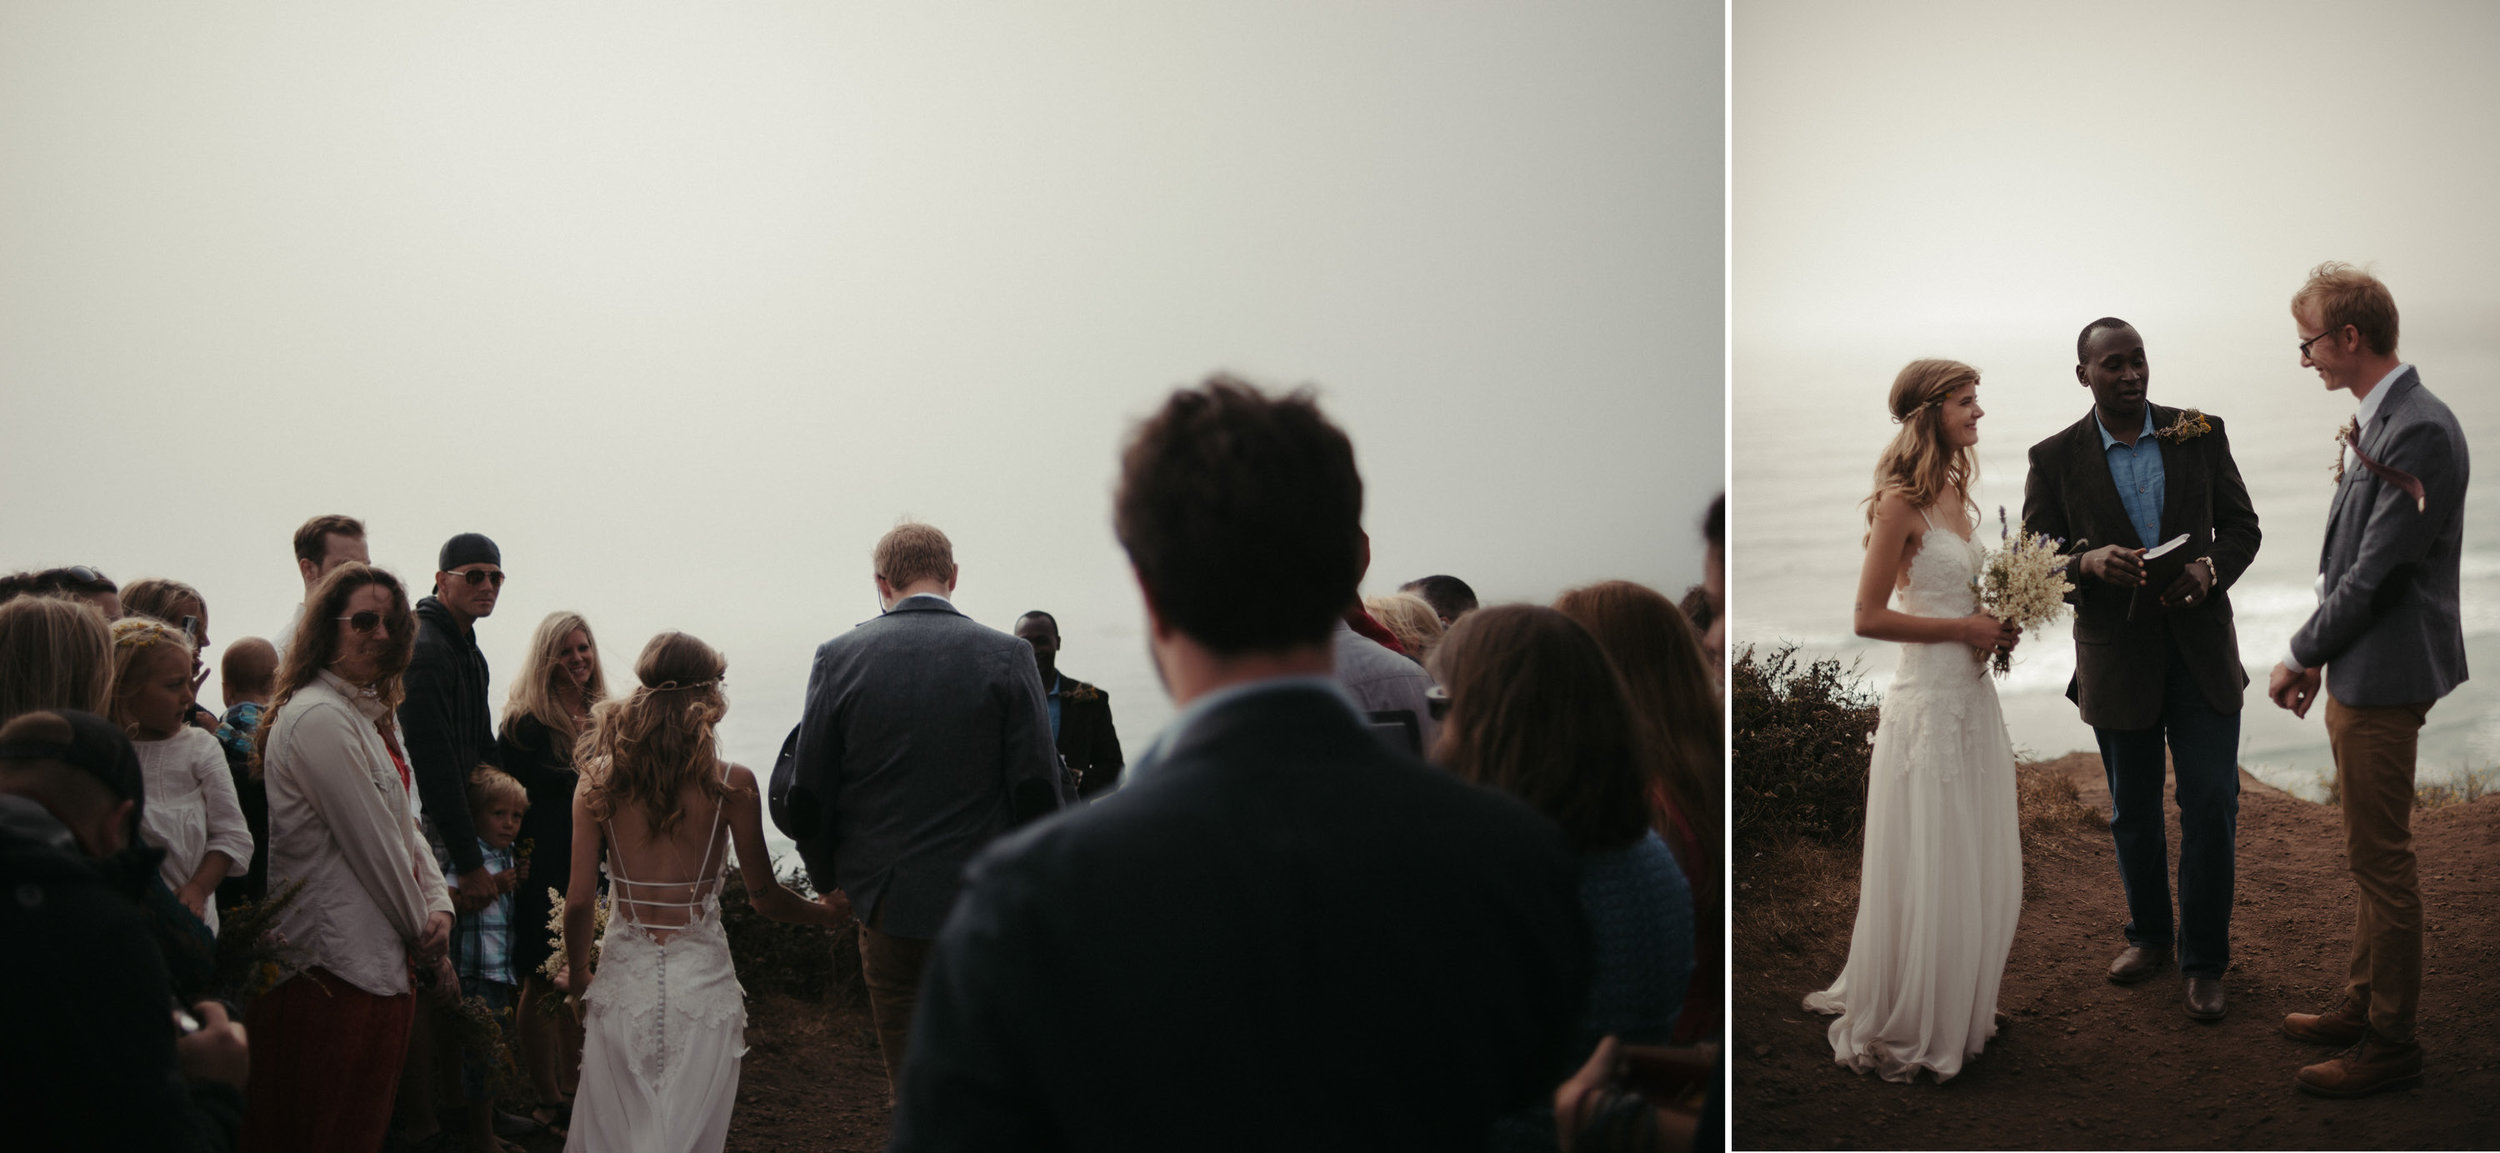 big-sur-adventure-elopement-photographer-108.jpg